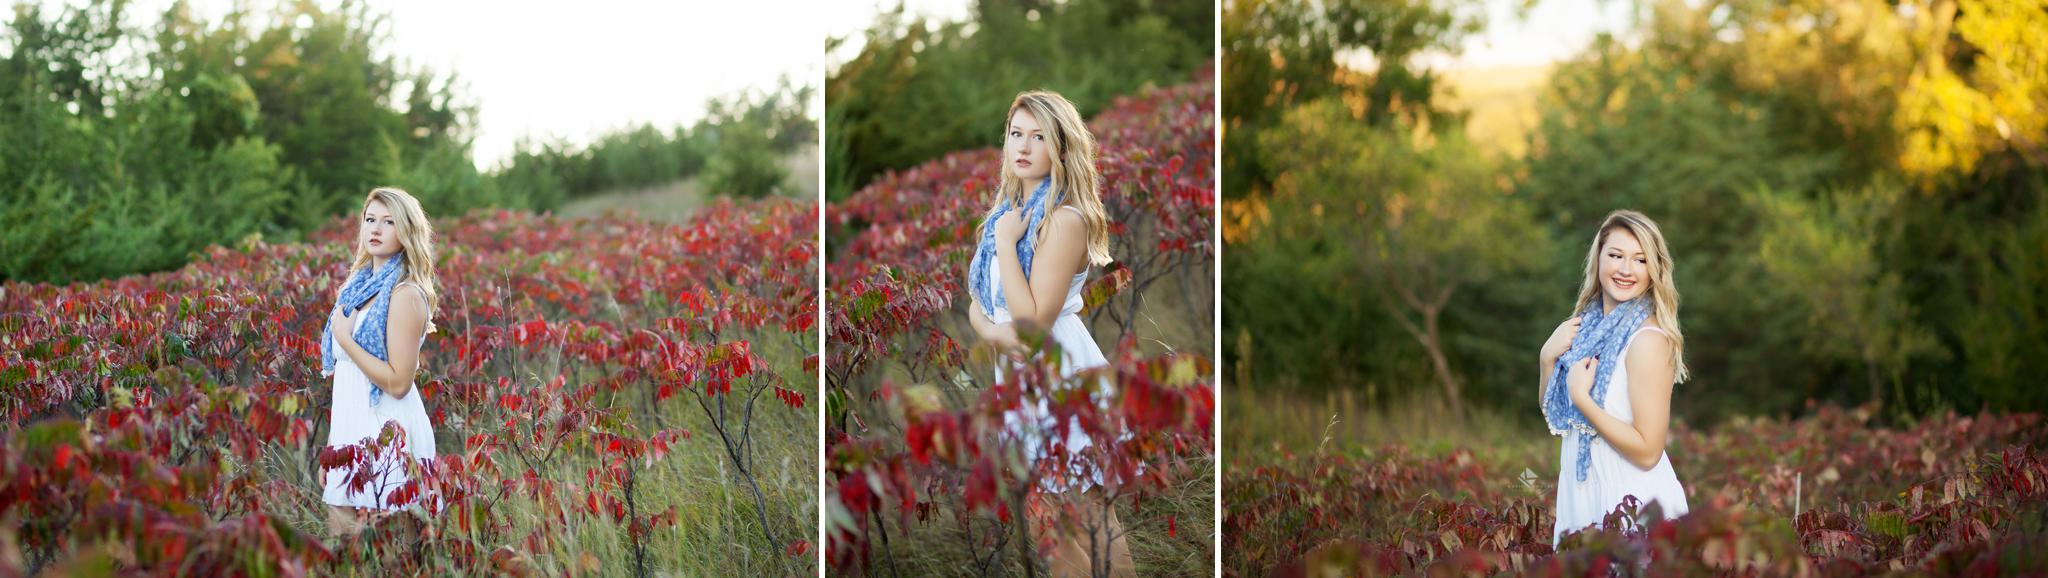 South Dakota Senior Pictures | Country Senior Pictures by Katie Swatek Photography | Sumac Senior Pictures by Katie Swatek Photography